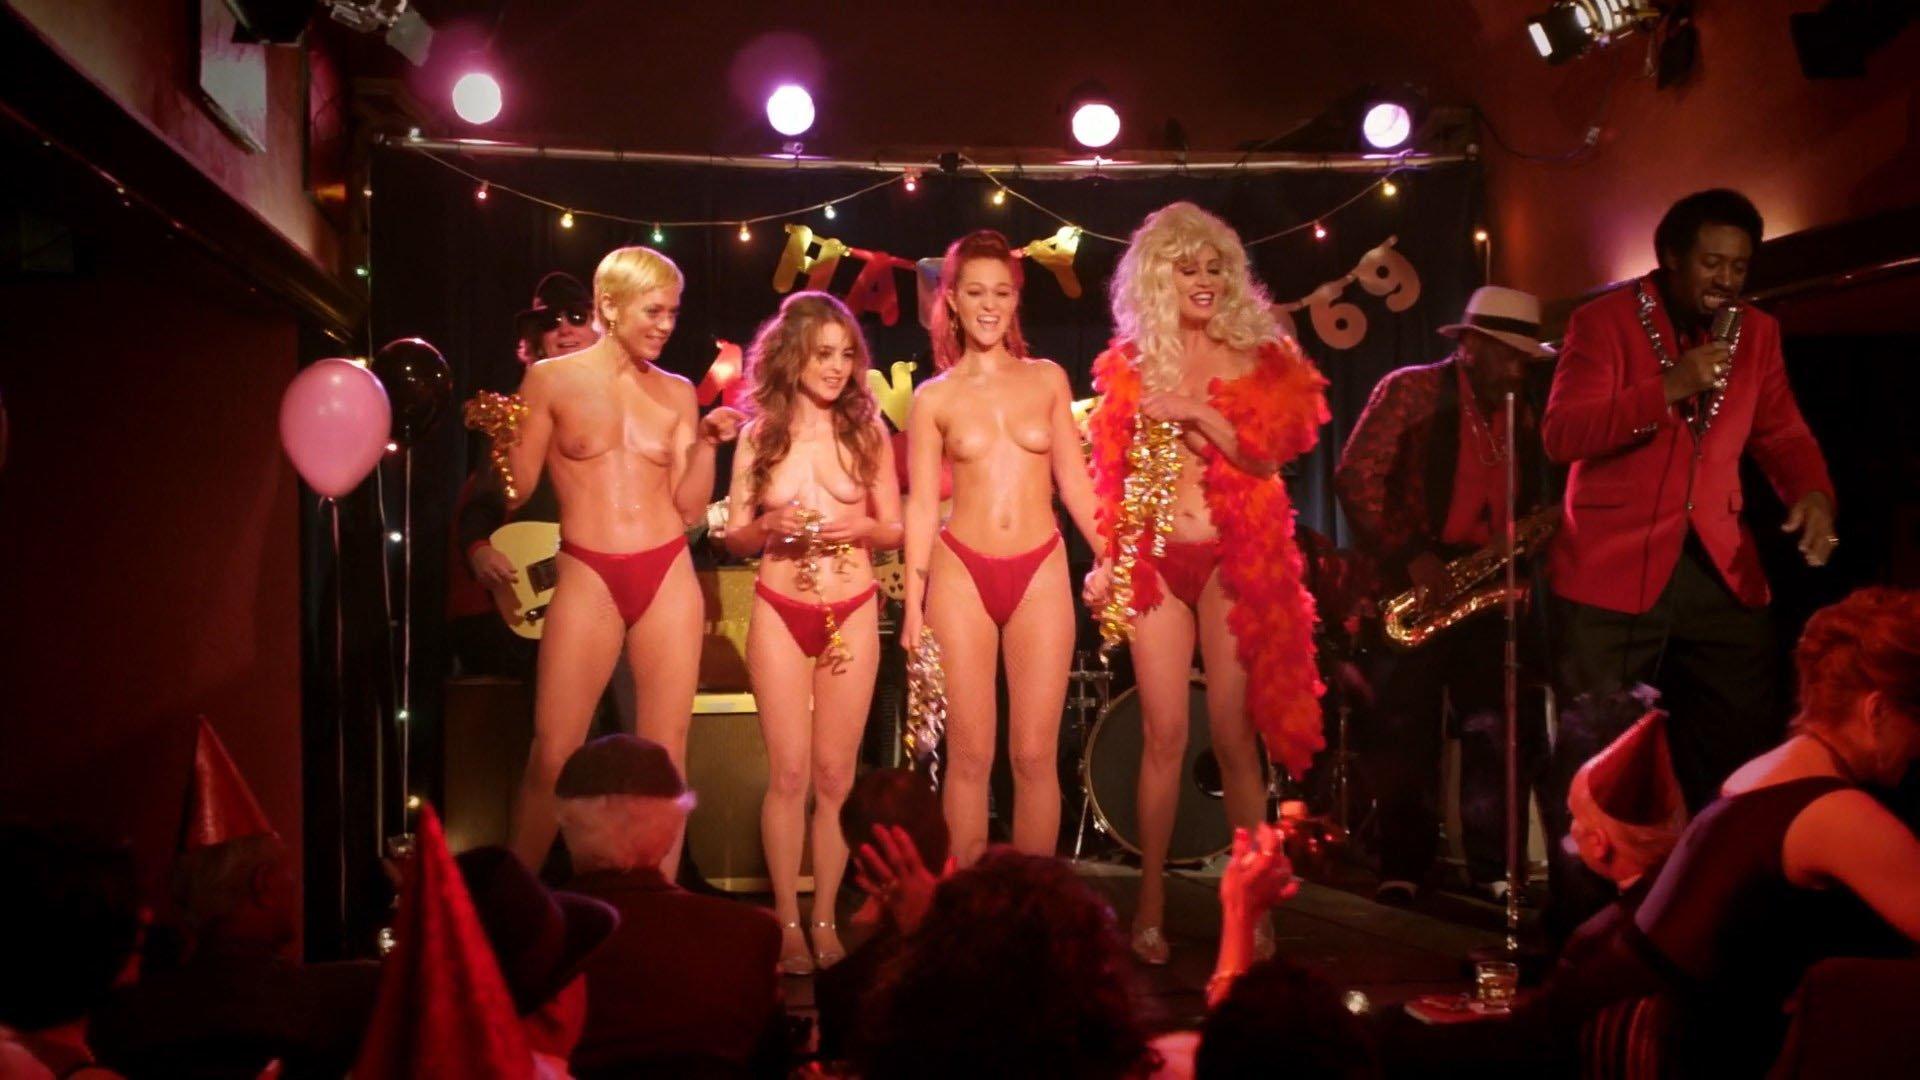 Elizabeth Rice nude, Nicole Arianna Fox nude, Tonya Kay nude - Paradise Club (2016)